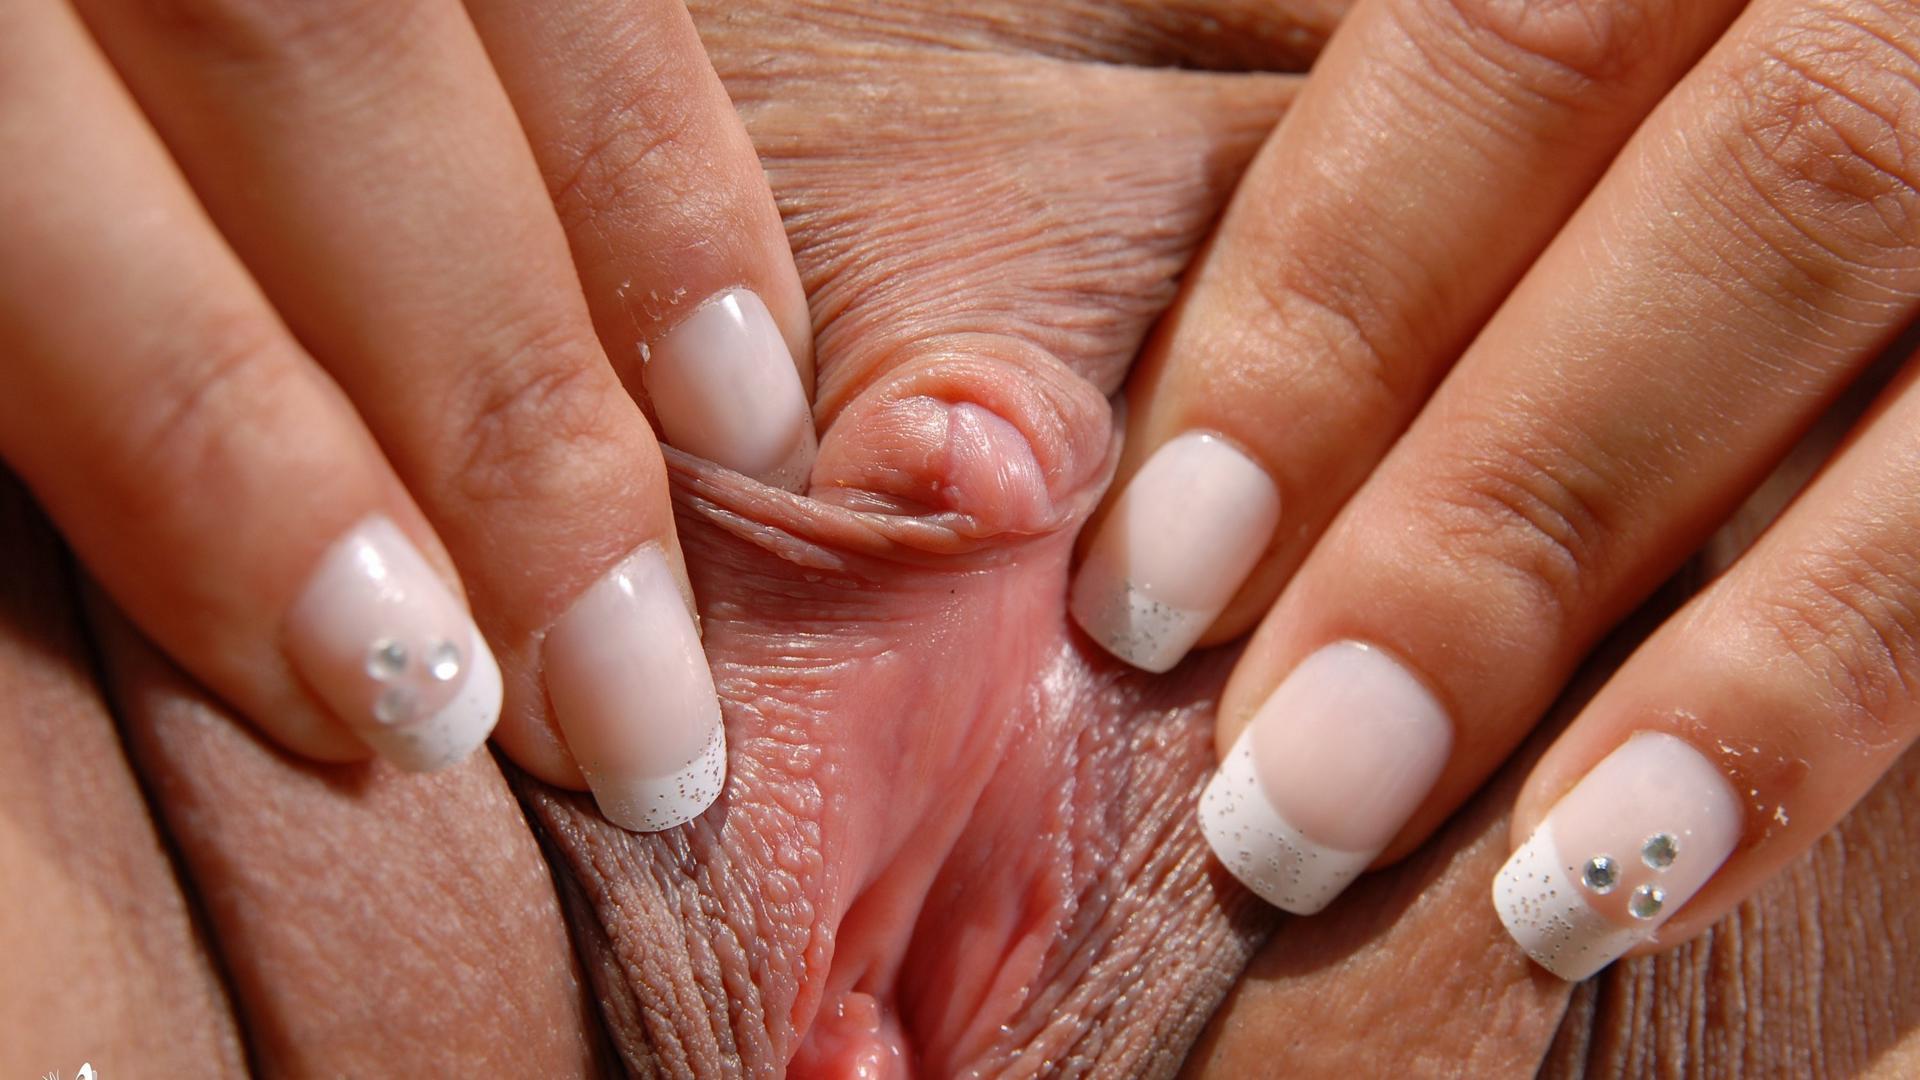 Petite girls and small dicks